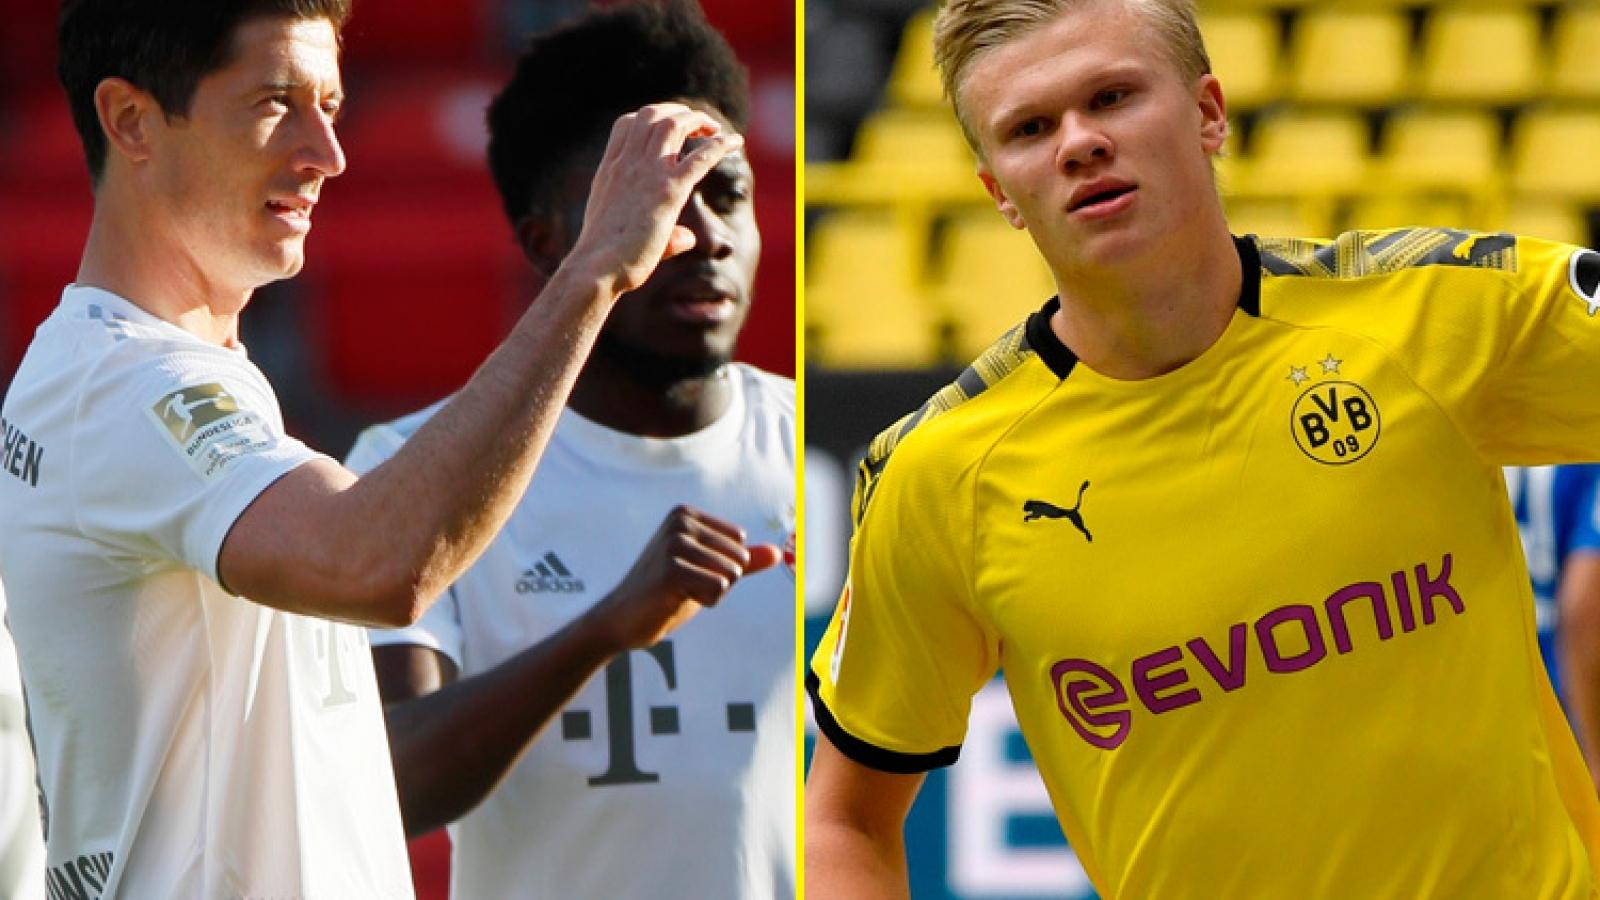 Đội hình hay nhất Bundesliga cuối tuần qua: Haaland đá cặp Lewandowski